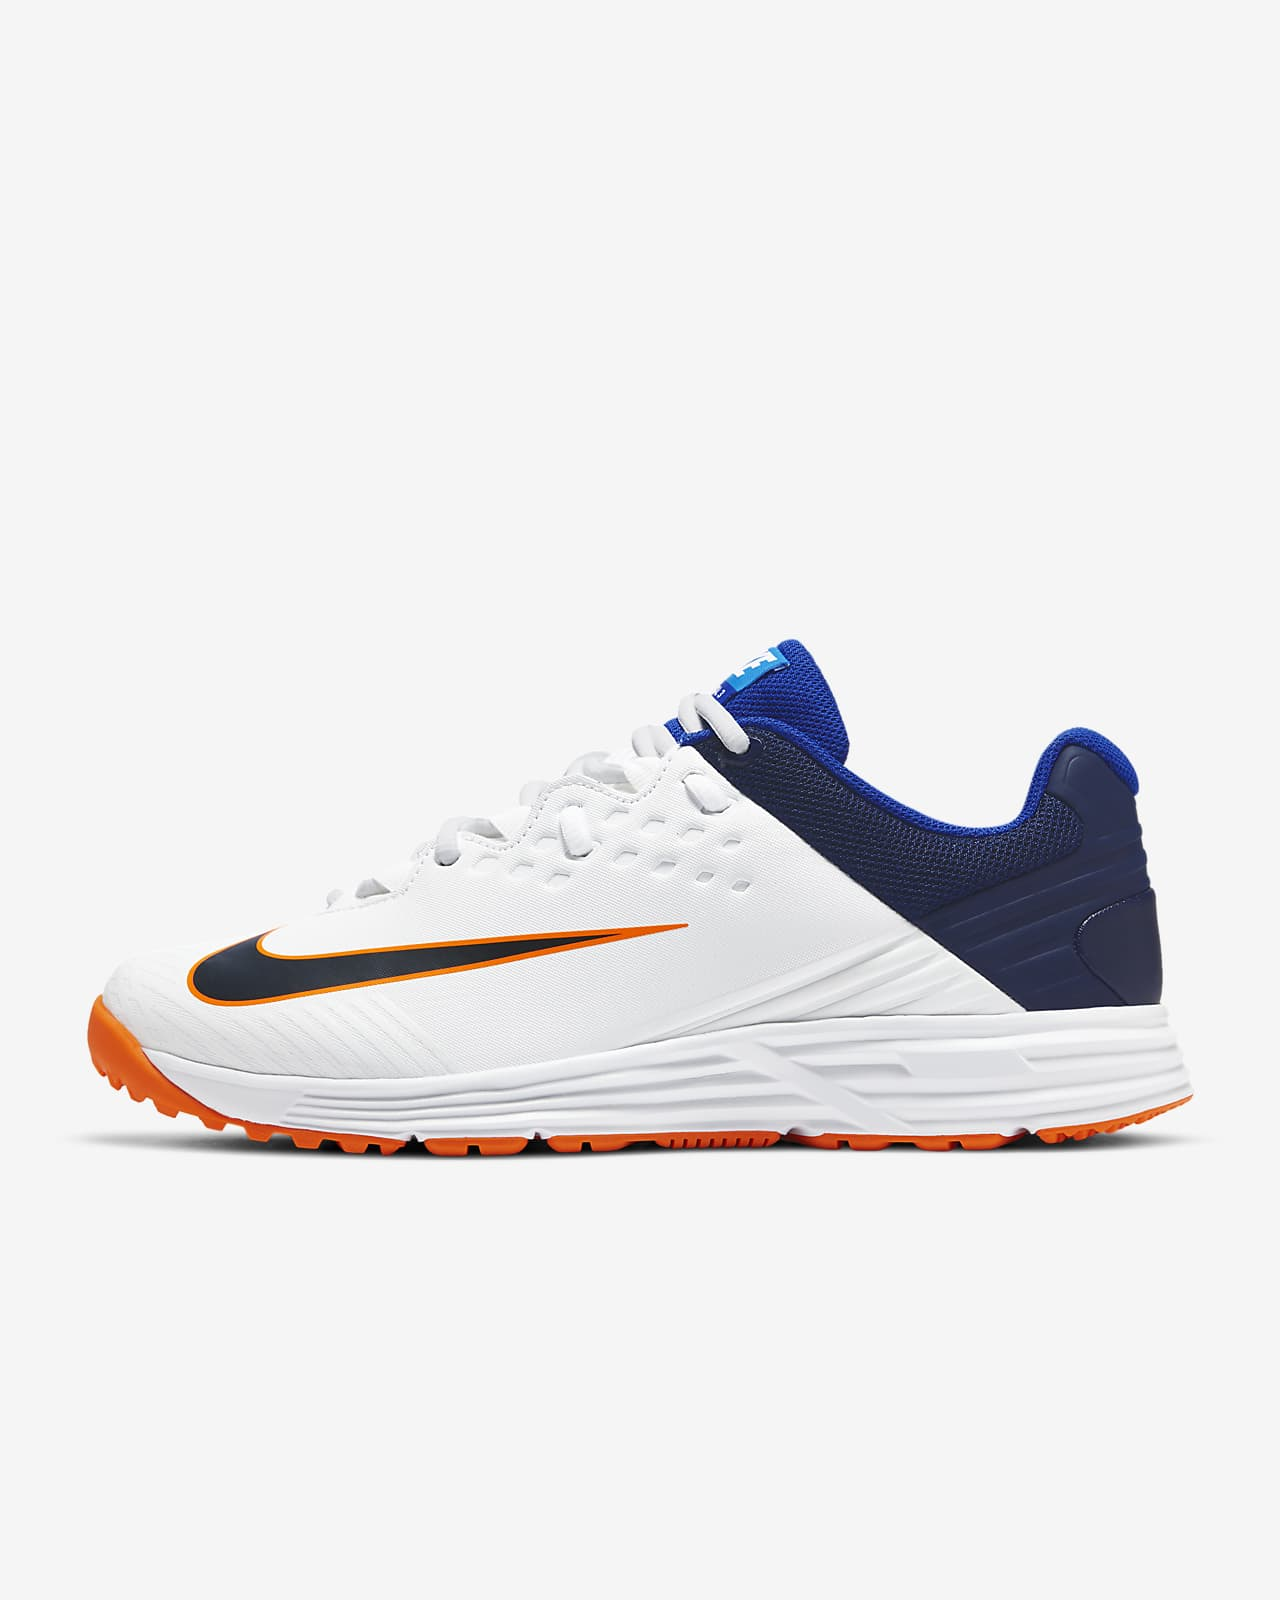 Nike Potential 3 Unisex Cricket Shoe